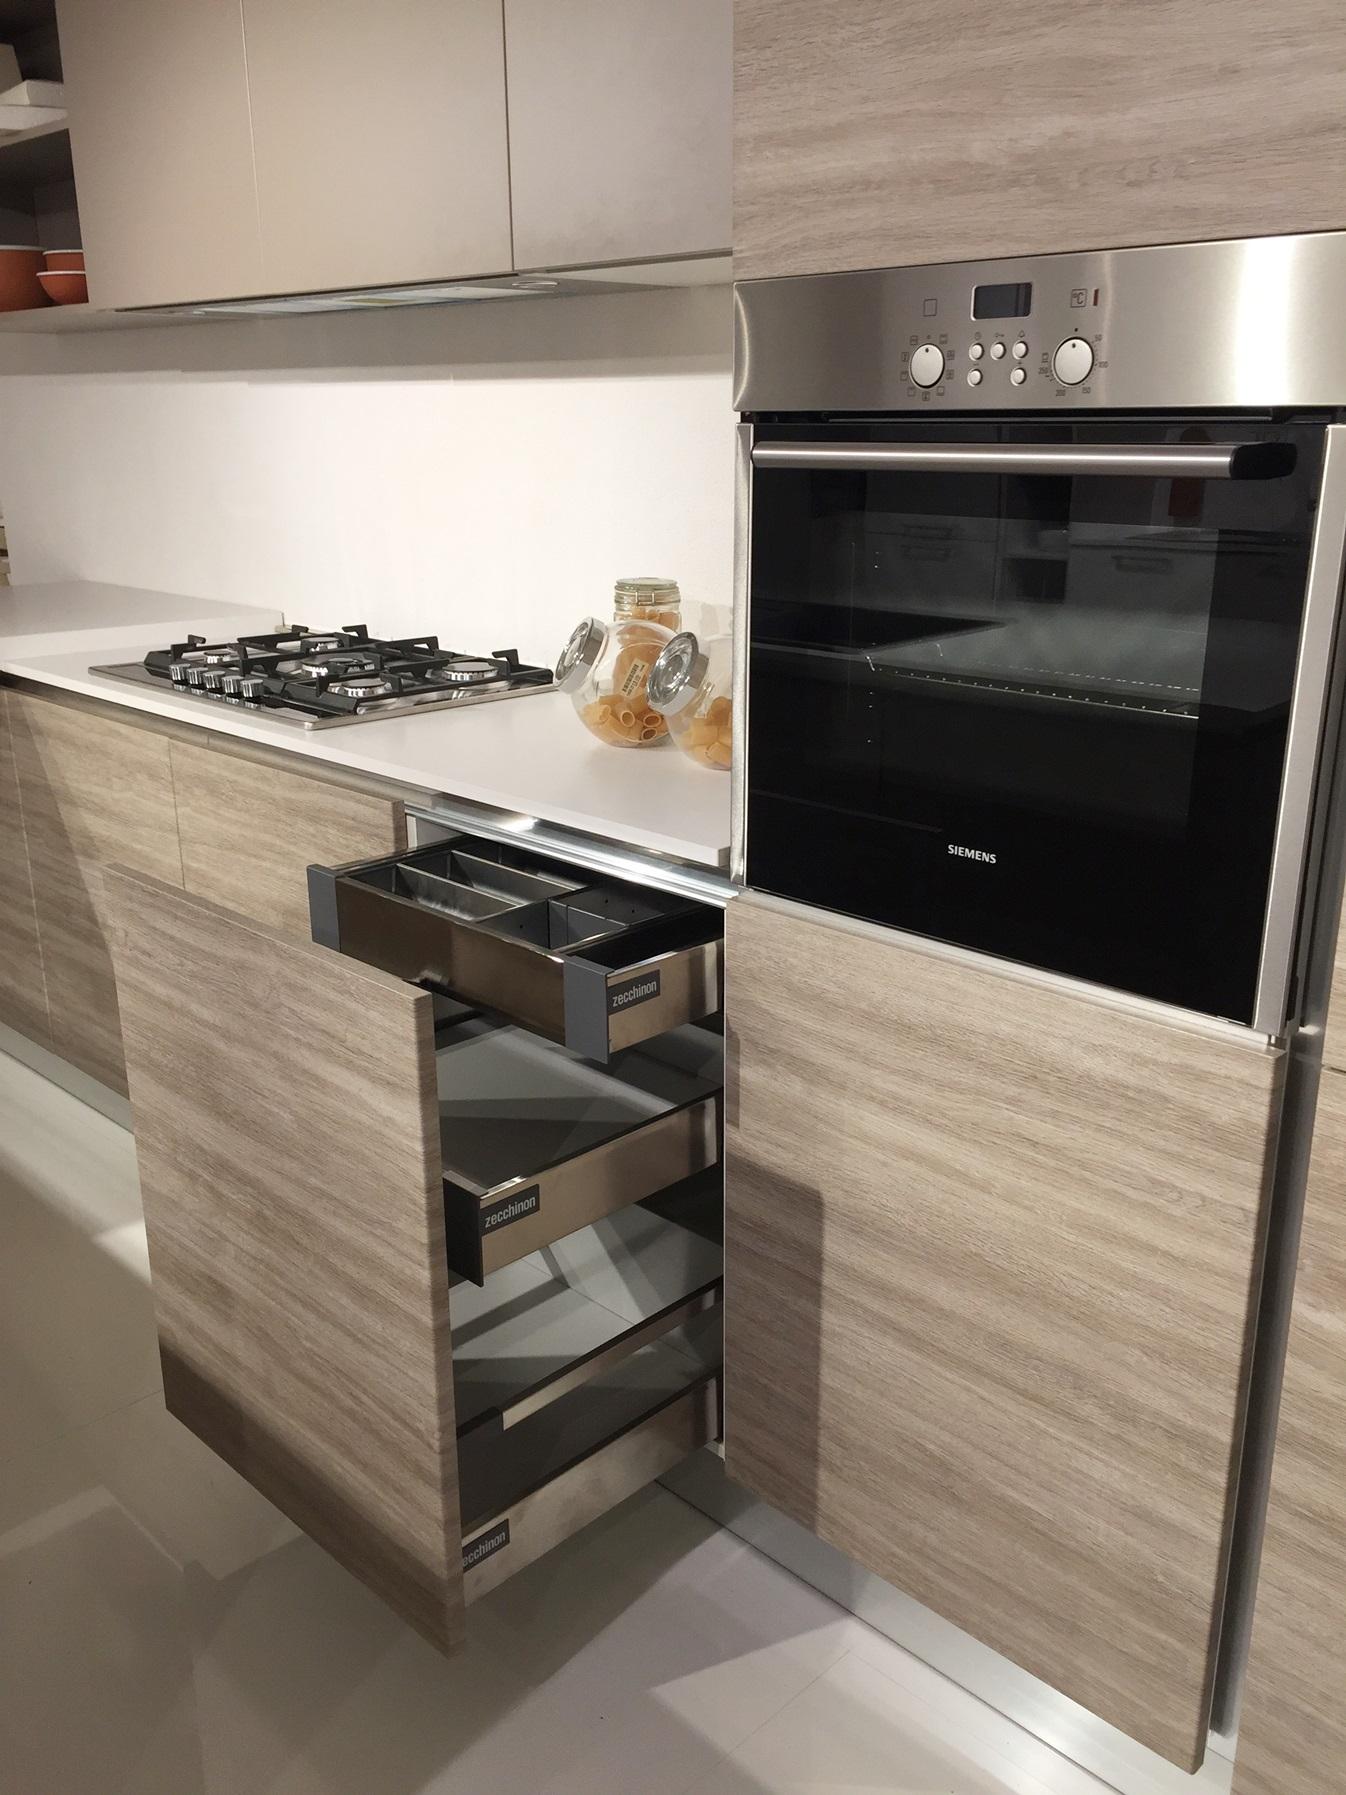 cucina zecchinon venus system kappa - cucine a prezzi scontati - Kappa Cucine